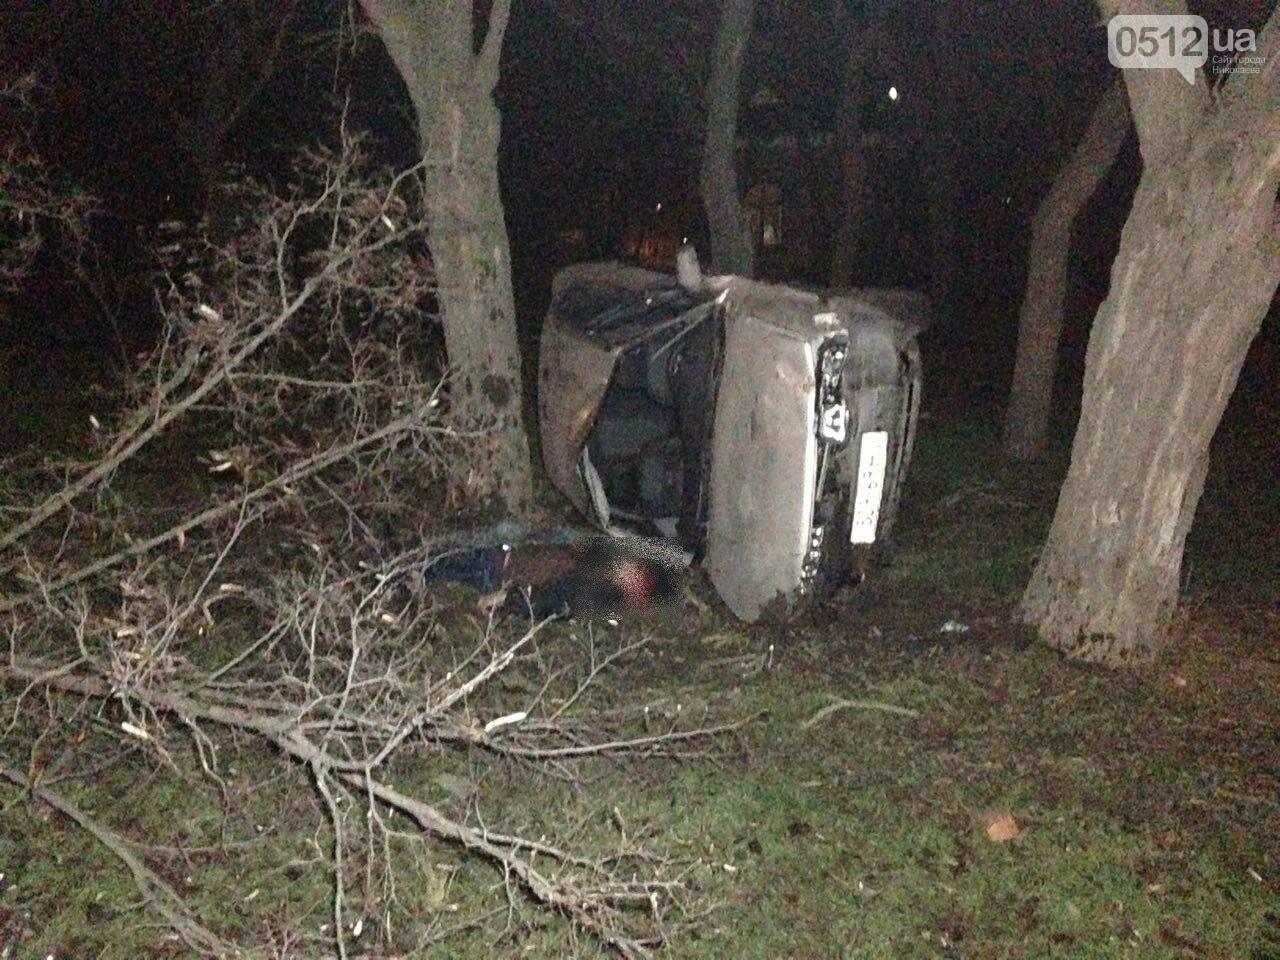 Страшное ДТП в Николаеве: 2 парня и 2 девушки на Мазде влетели в дерево - водитель умер на месте аварии, - ФОТО, фото-8